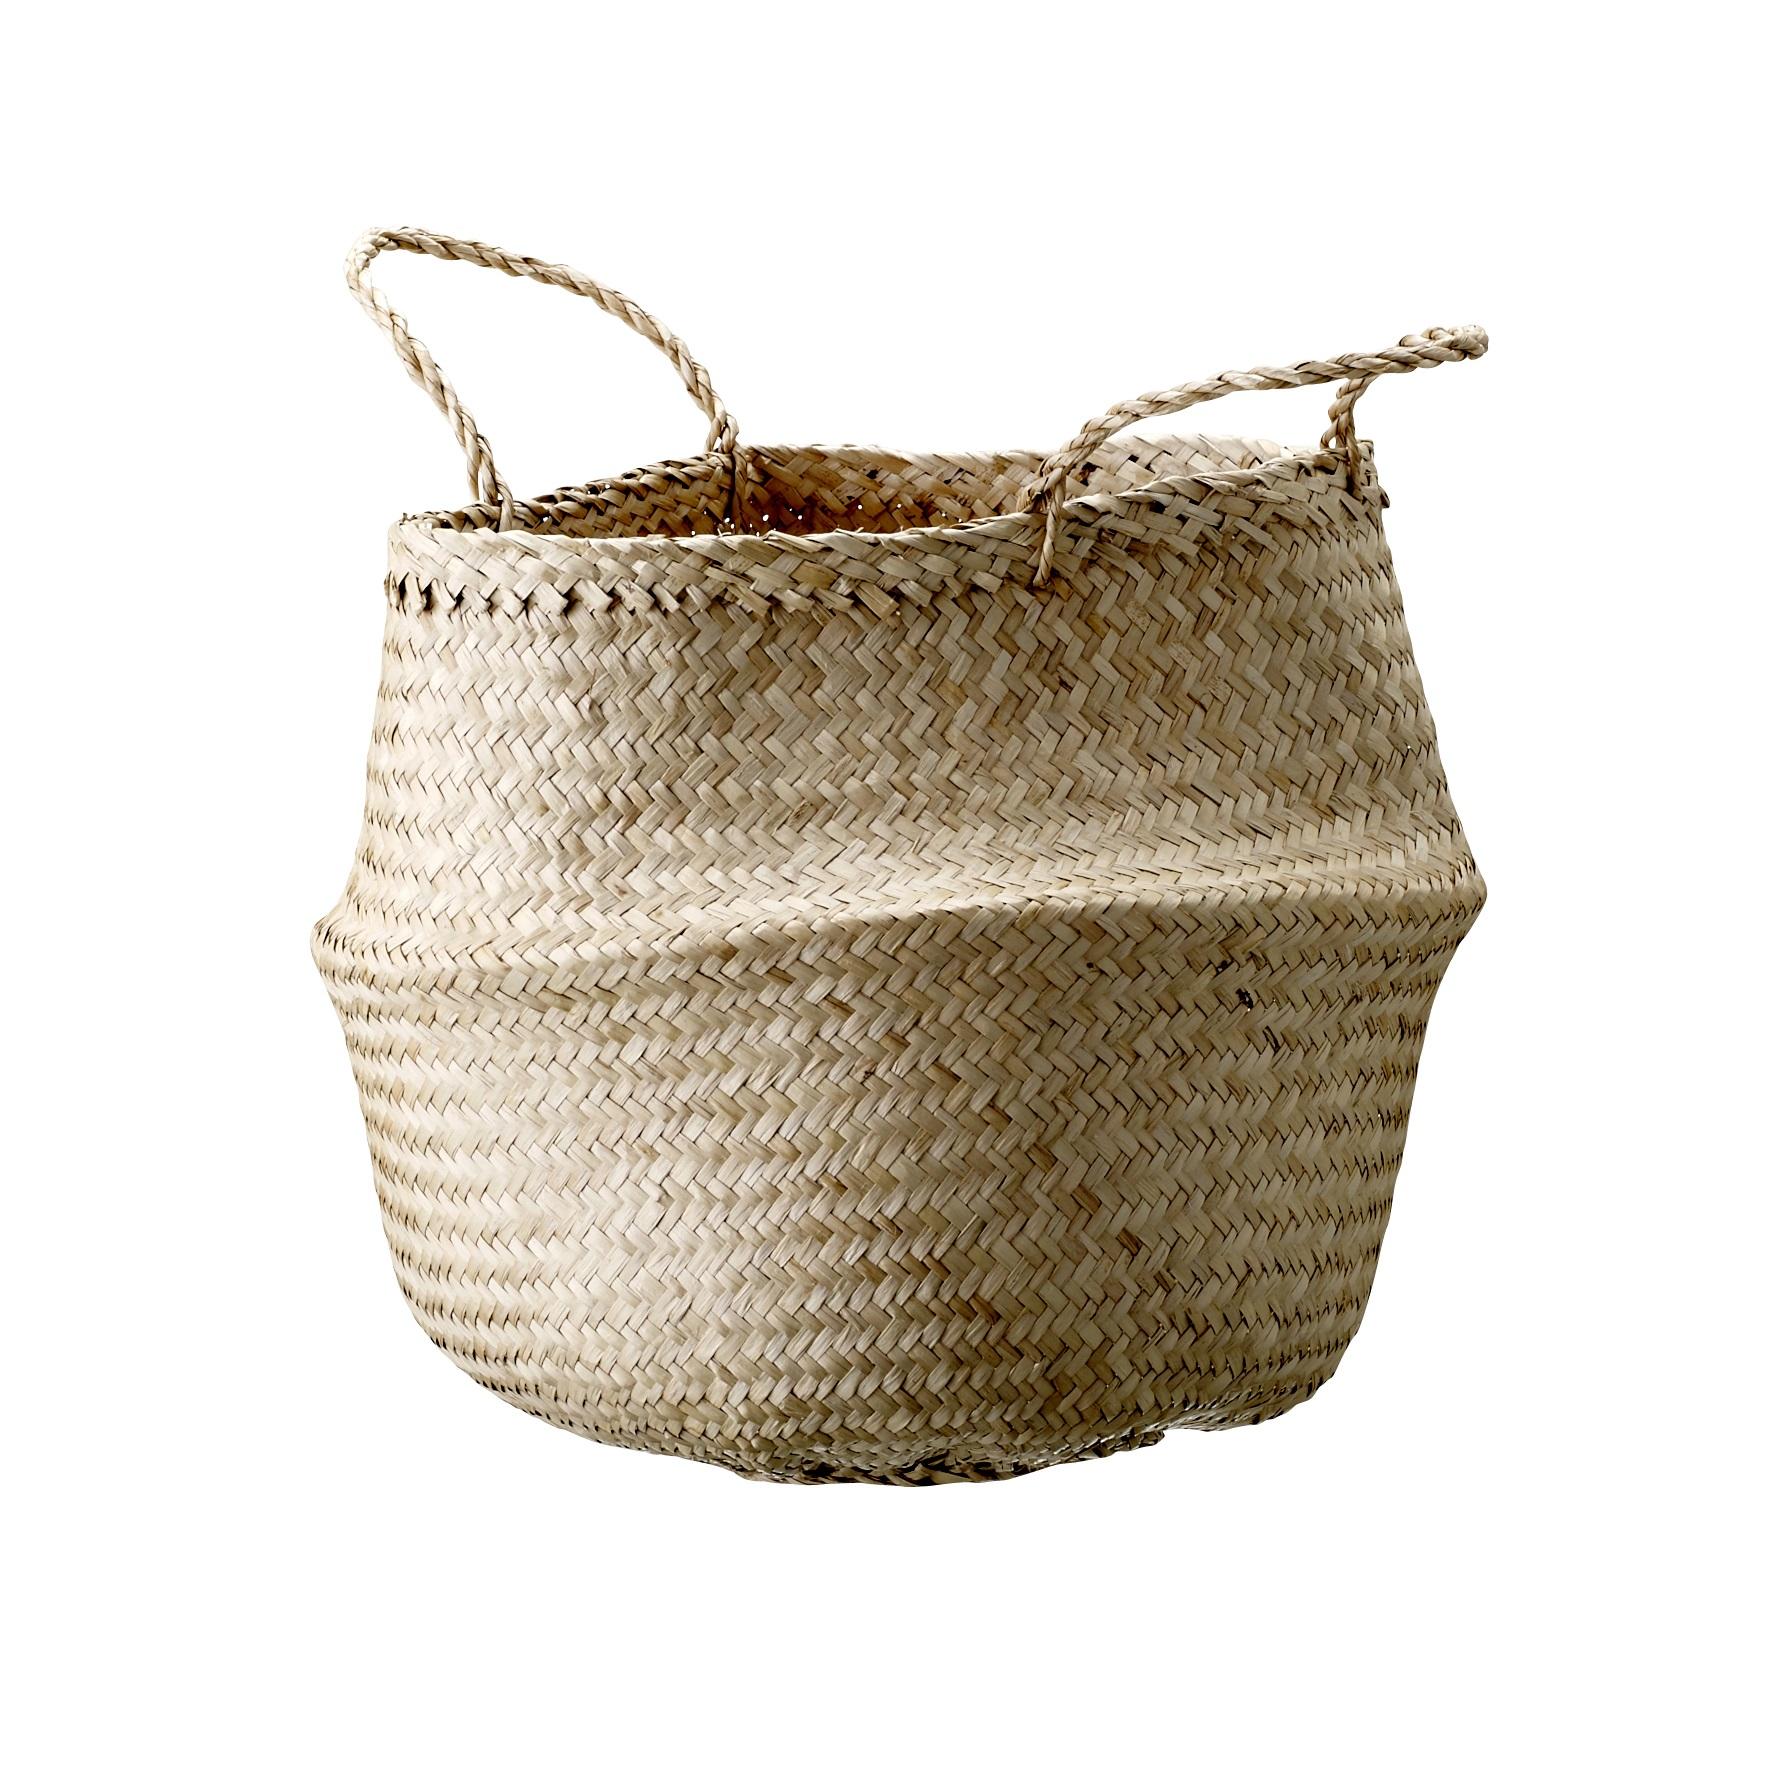 Корзина SoftКорзины<br>Корзина SOFT плетеная.&amp;nbsp;Материал: водоросли.<br><br>kit: None<br>gender: None